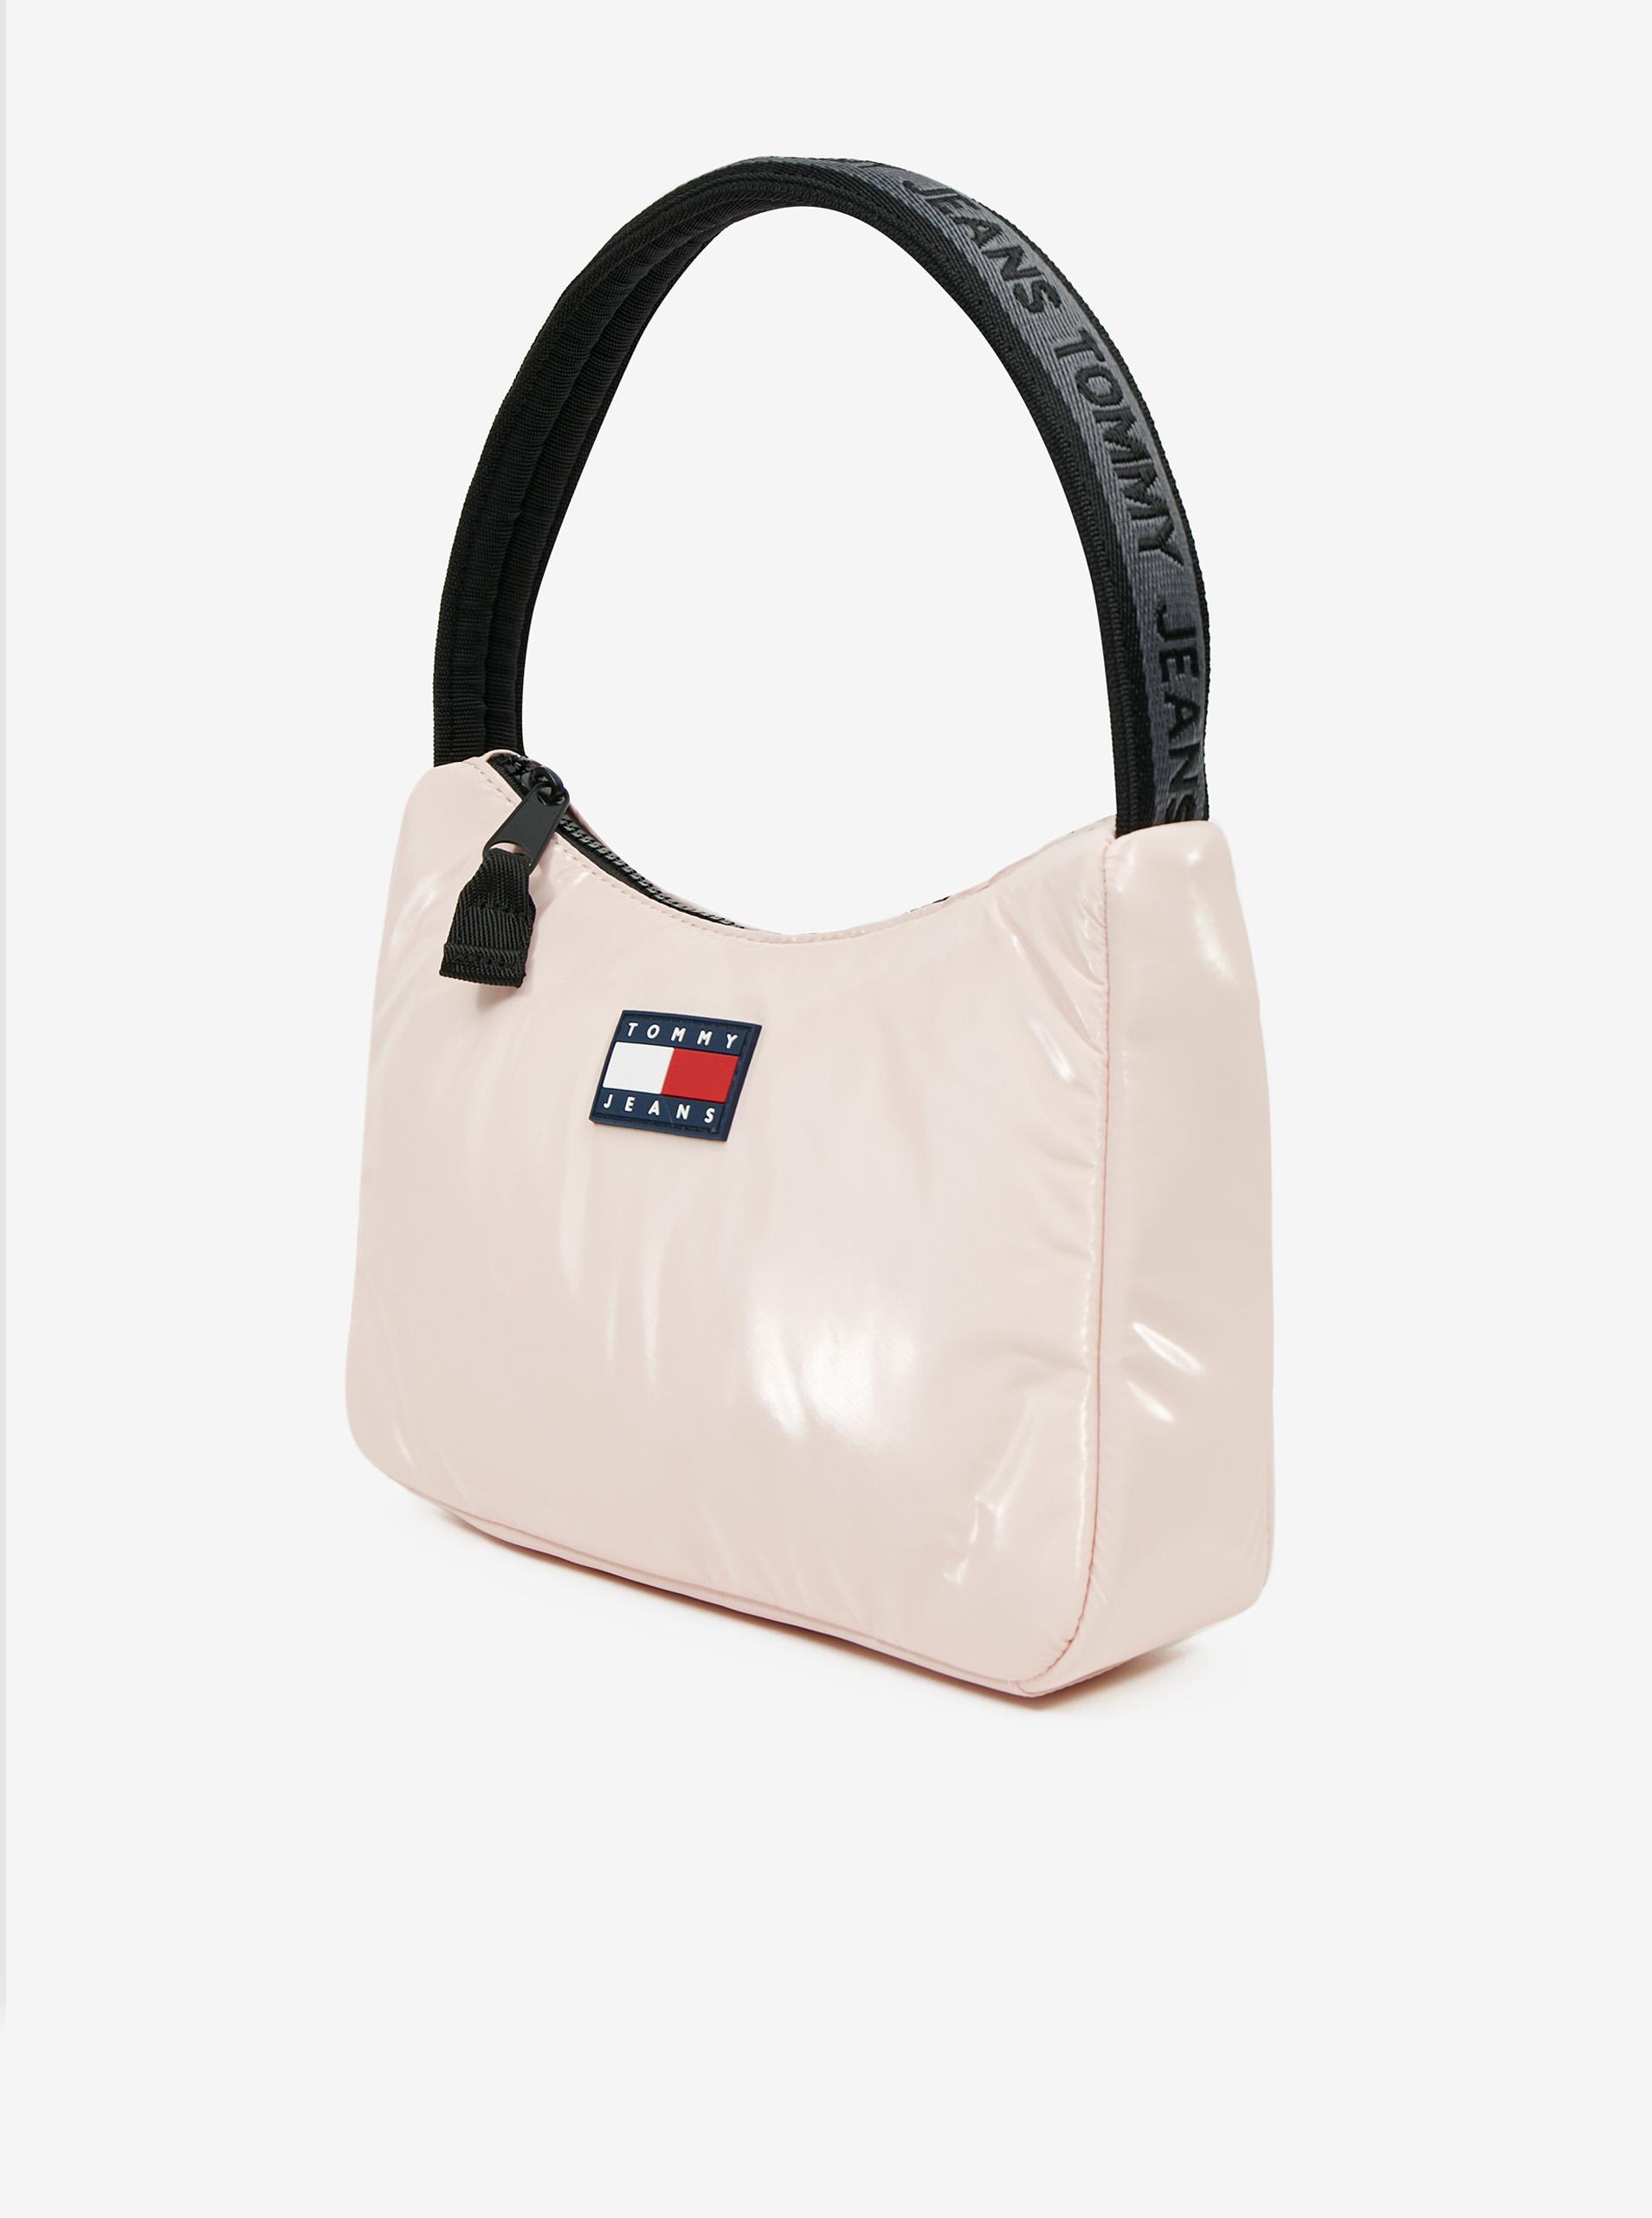 Tommy Hilfiger roza torbica